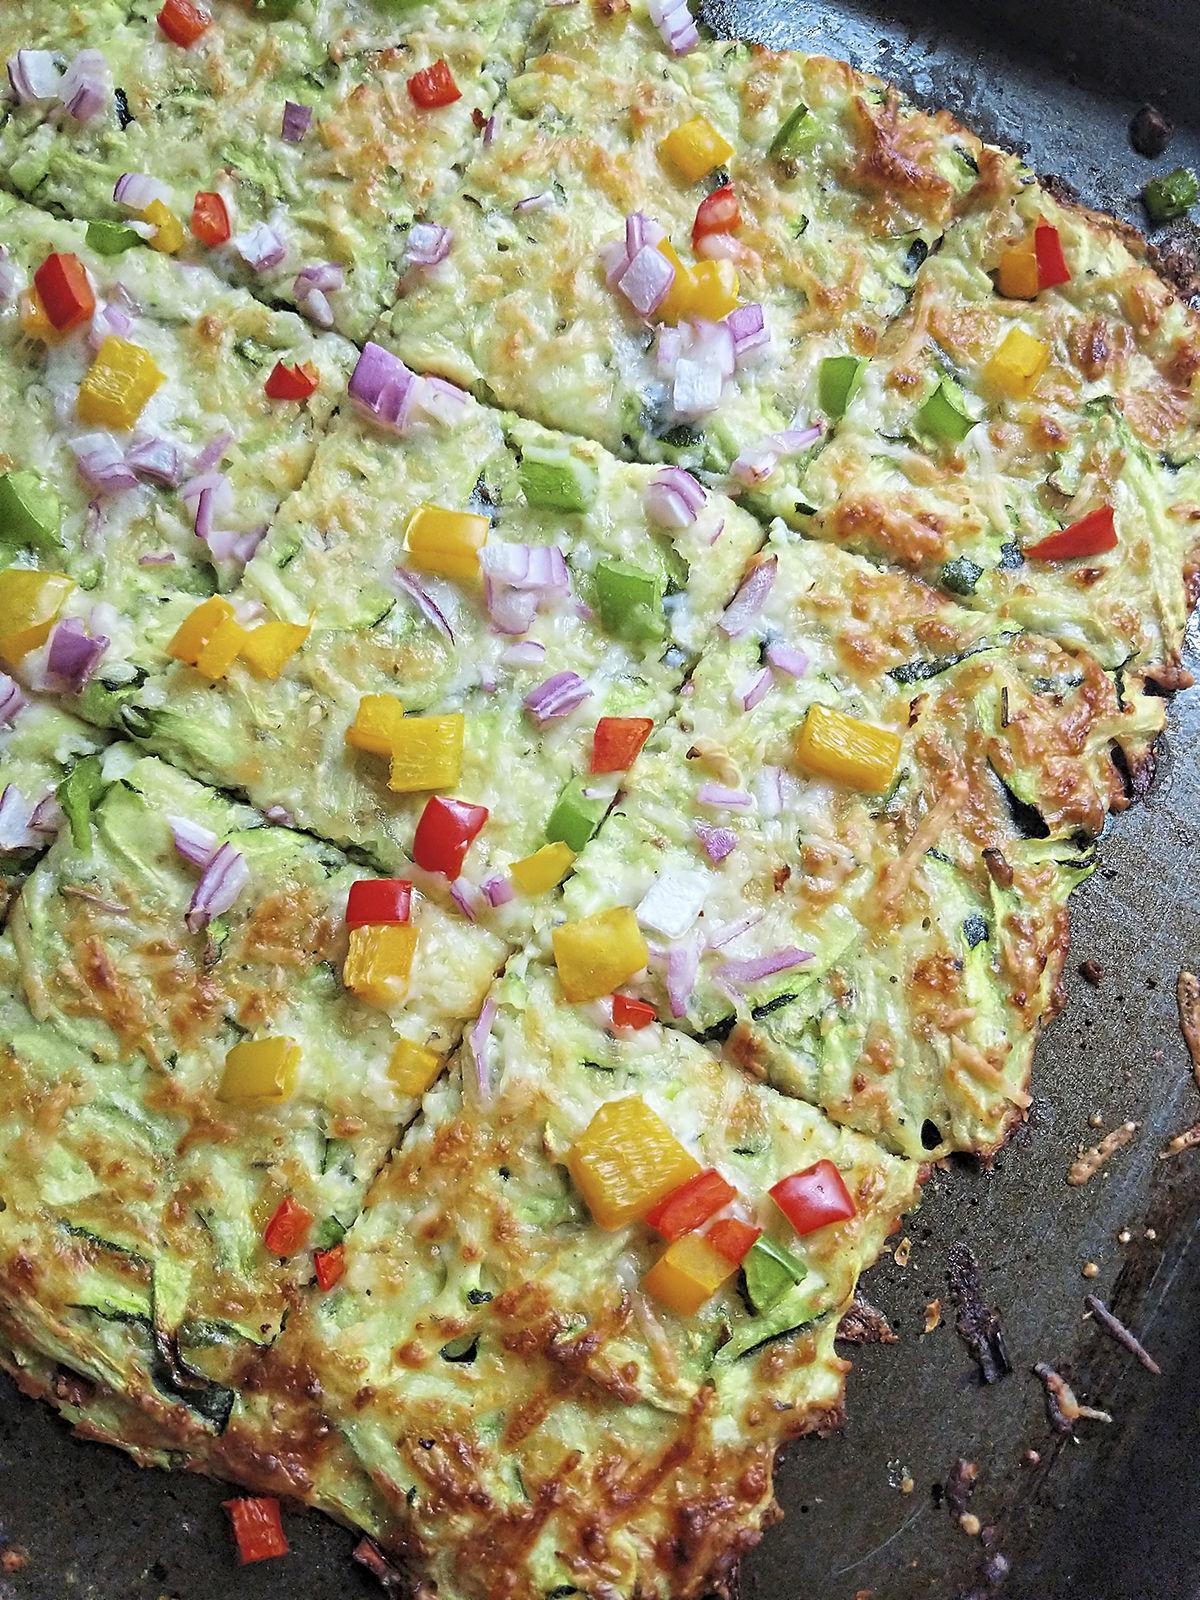 FOOD-ZUCCHINI-CRUST-PIZZA-3-PG